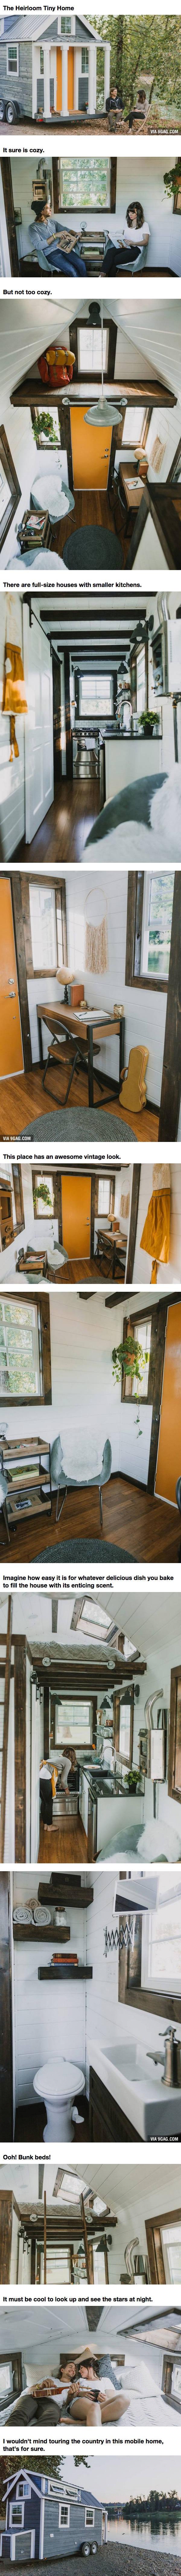 amazing pics of tiny mobile home